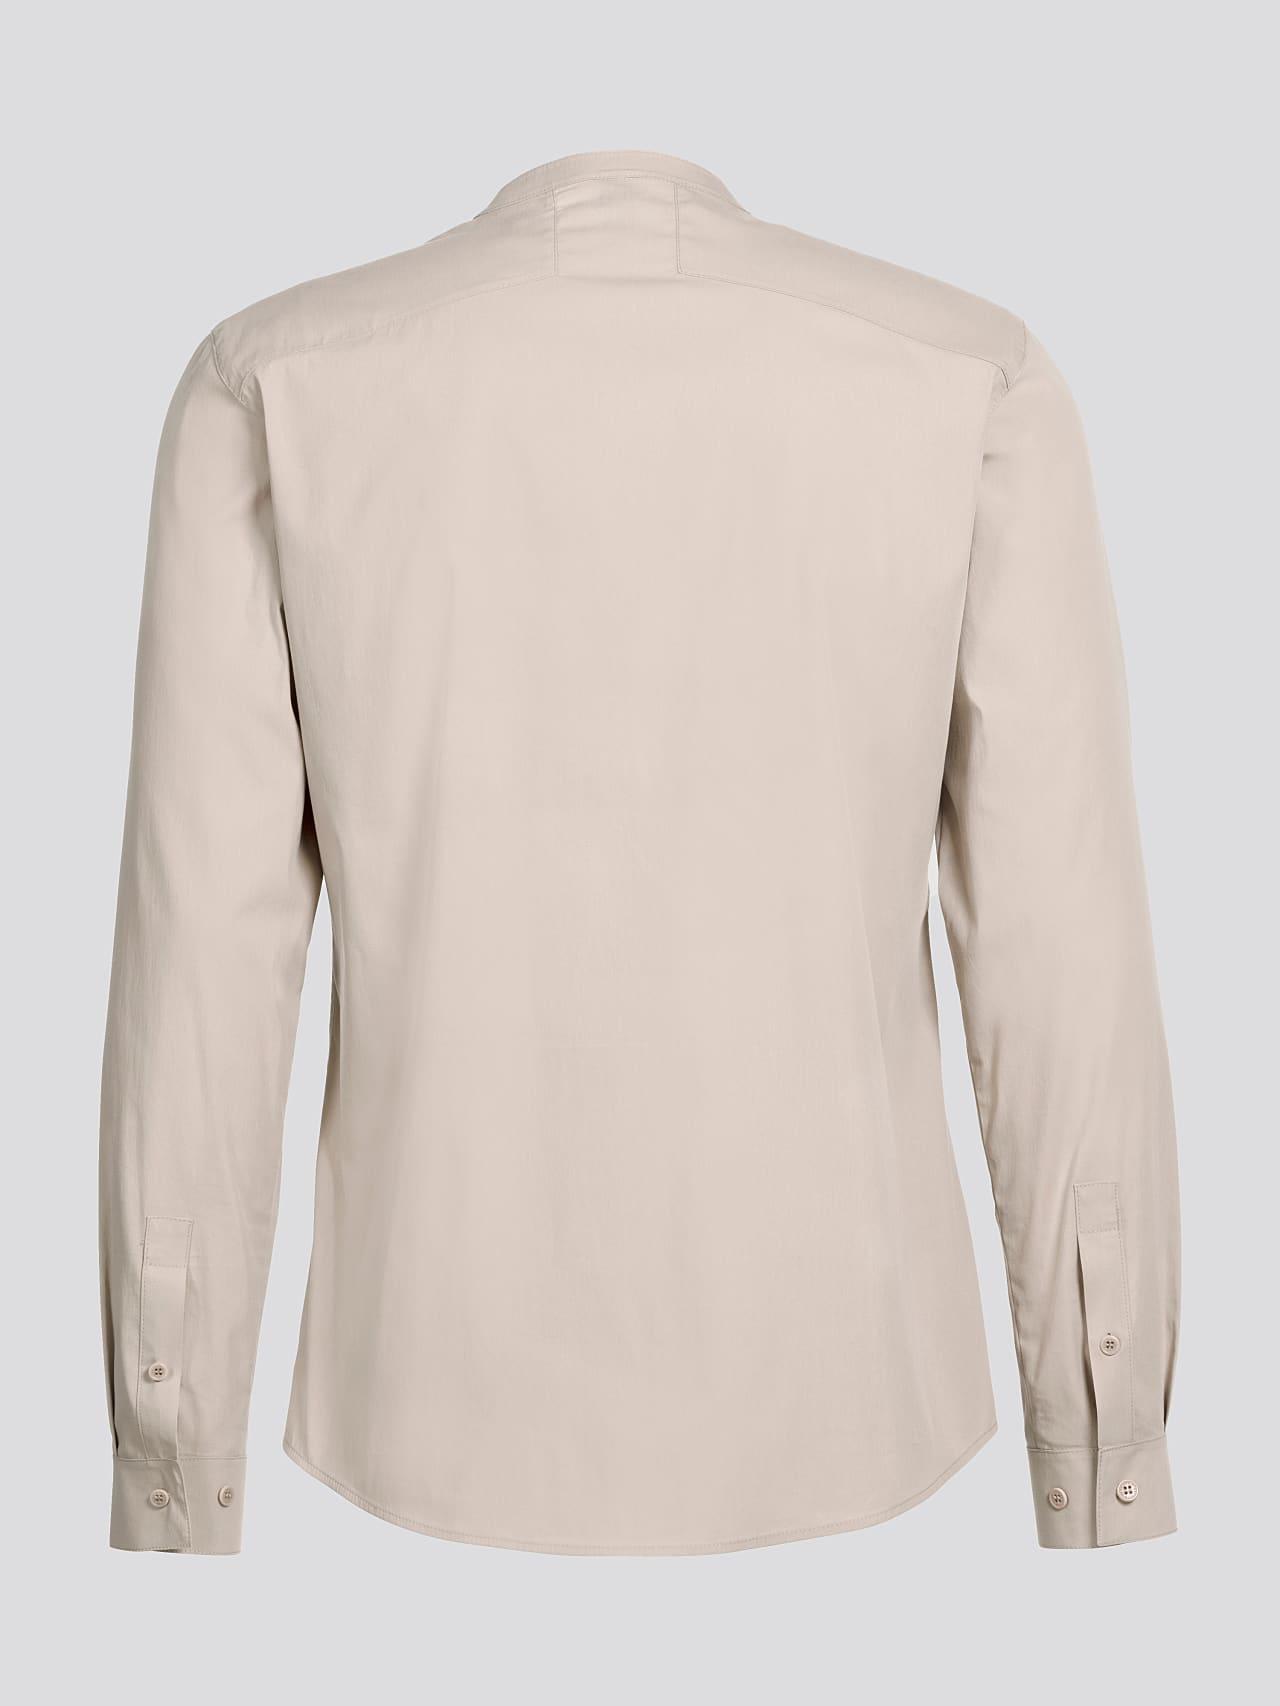 WIDT V9.Y5.01 Stand-Up Collar Cotton-Stretch Shirt Sand Left Alpha Tauri